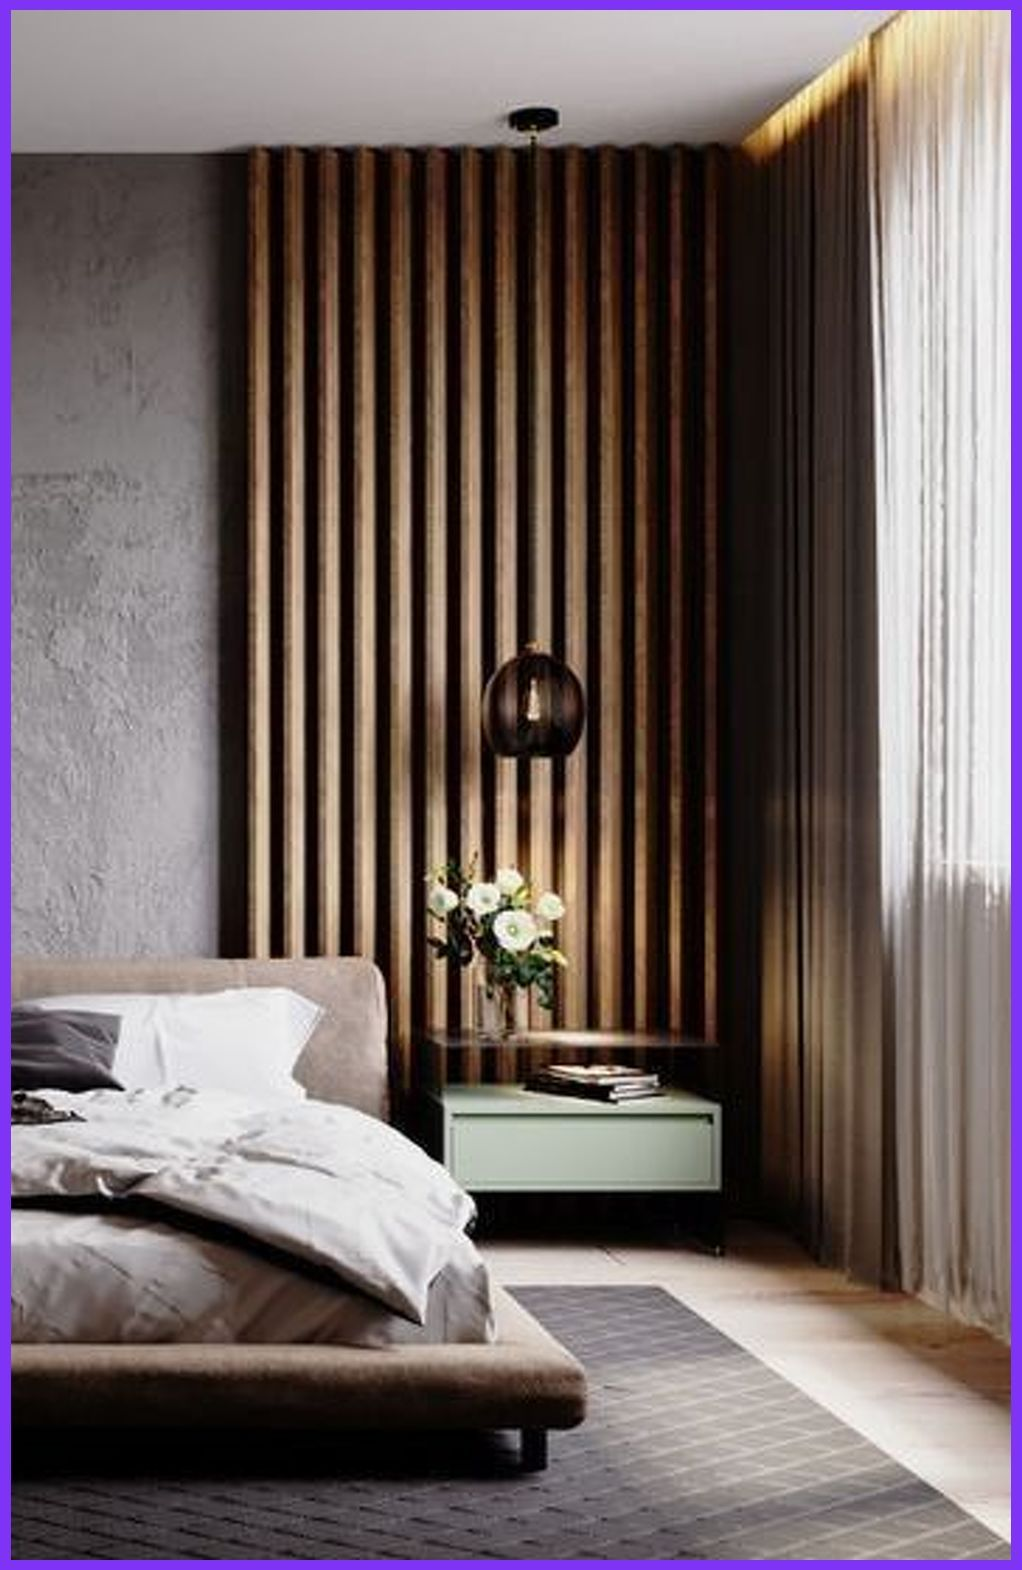 Most Popular Stunning Minimalist Modern Master Bedroom Design Best Ideas 9 Modern Minimalis Hotel Style Bedroom Bedroom Interior Luxury Bedroom Master Bedroom design modern contemporary